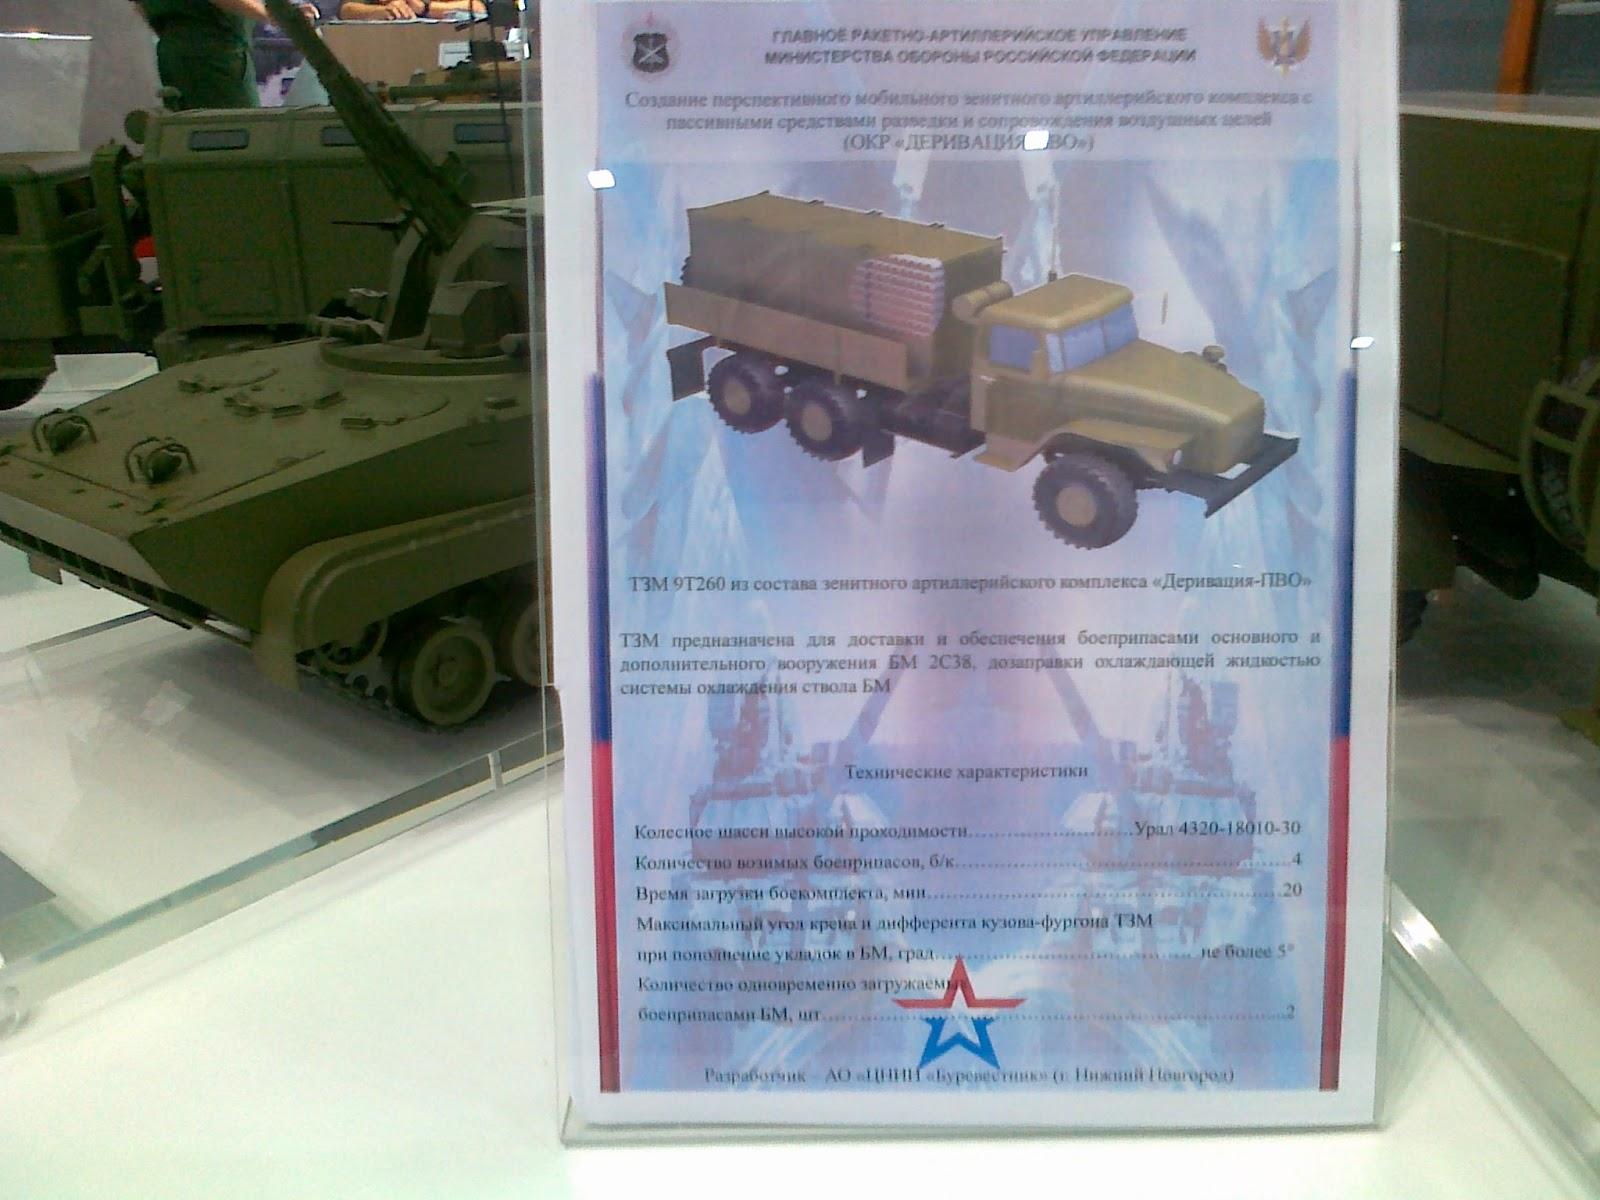 https://vpk.name/file/img/transportnozaryazhayushaya_mashina_9t260-ak2z0gc3-1503849998.jpg